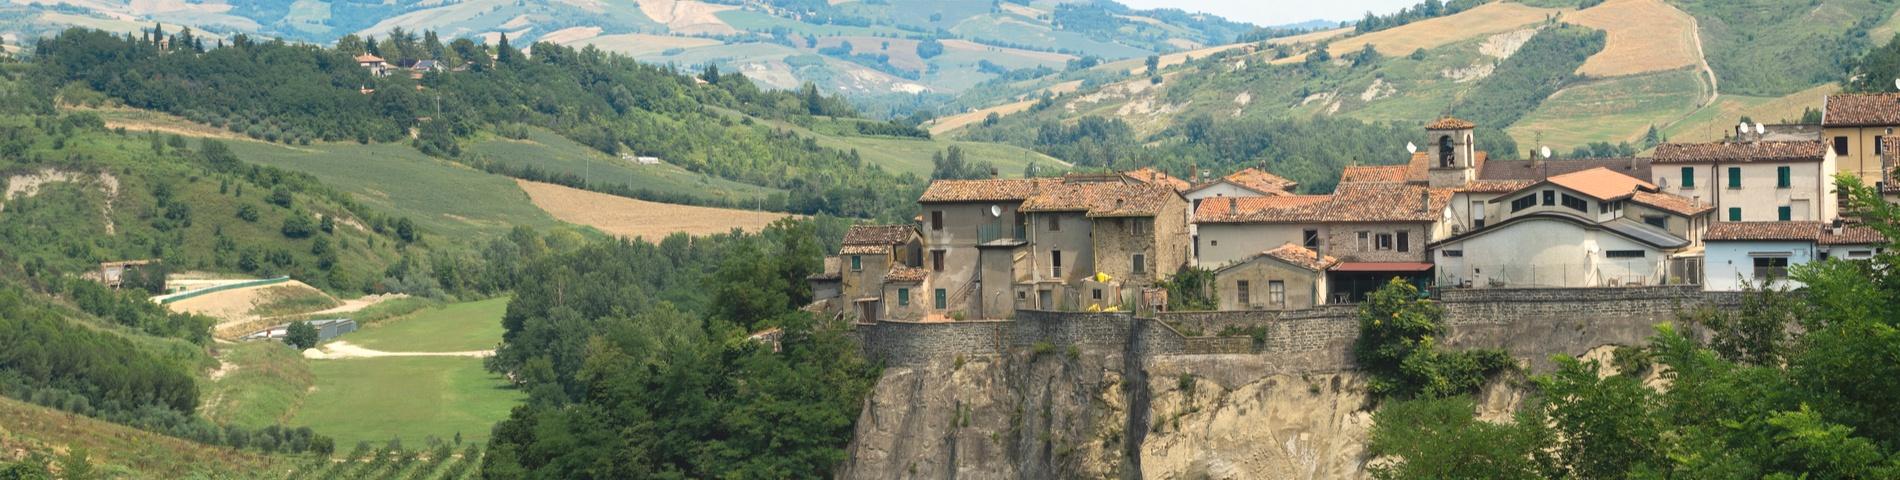 Escolas de Idioma Bagno di Romagna - Cursos de Italiano